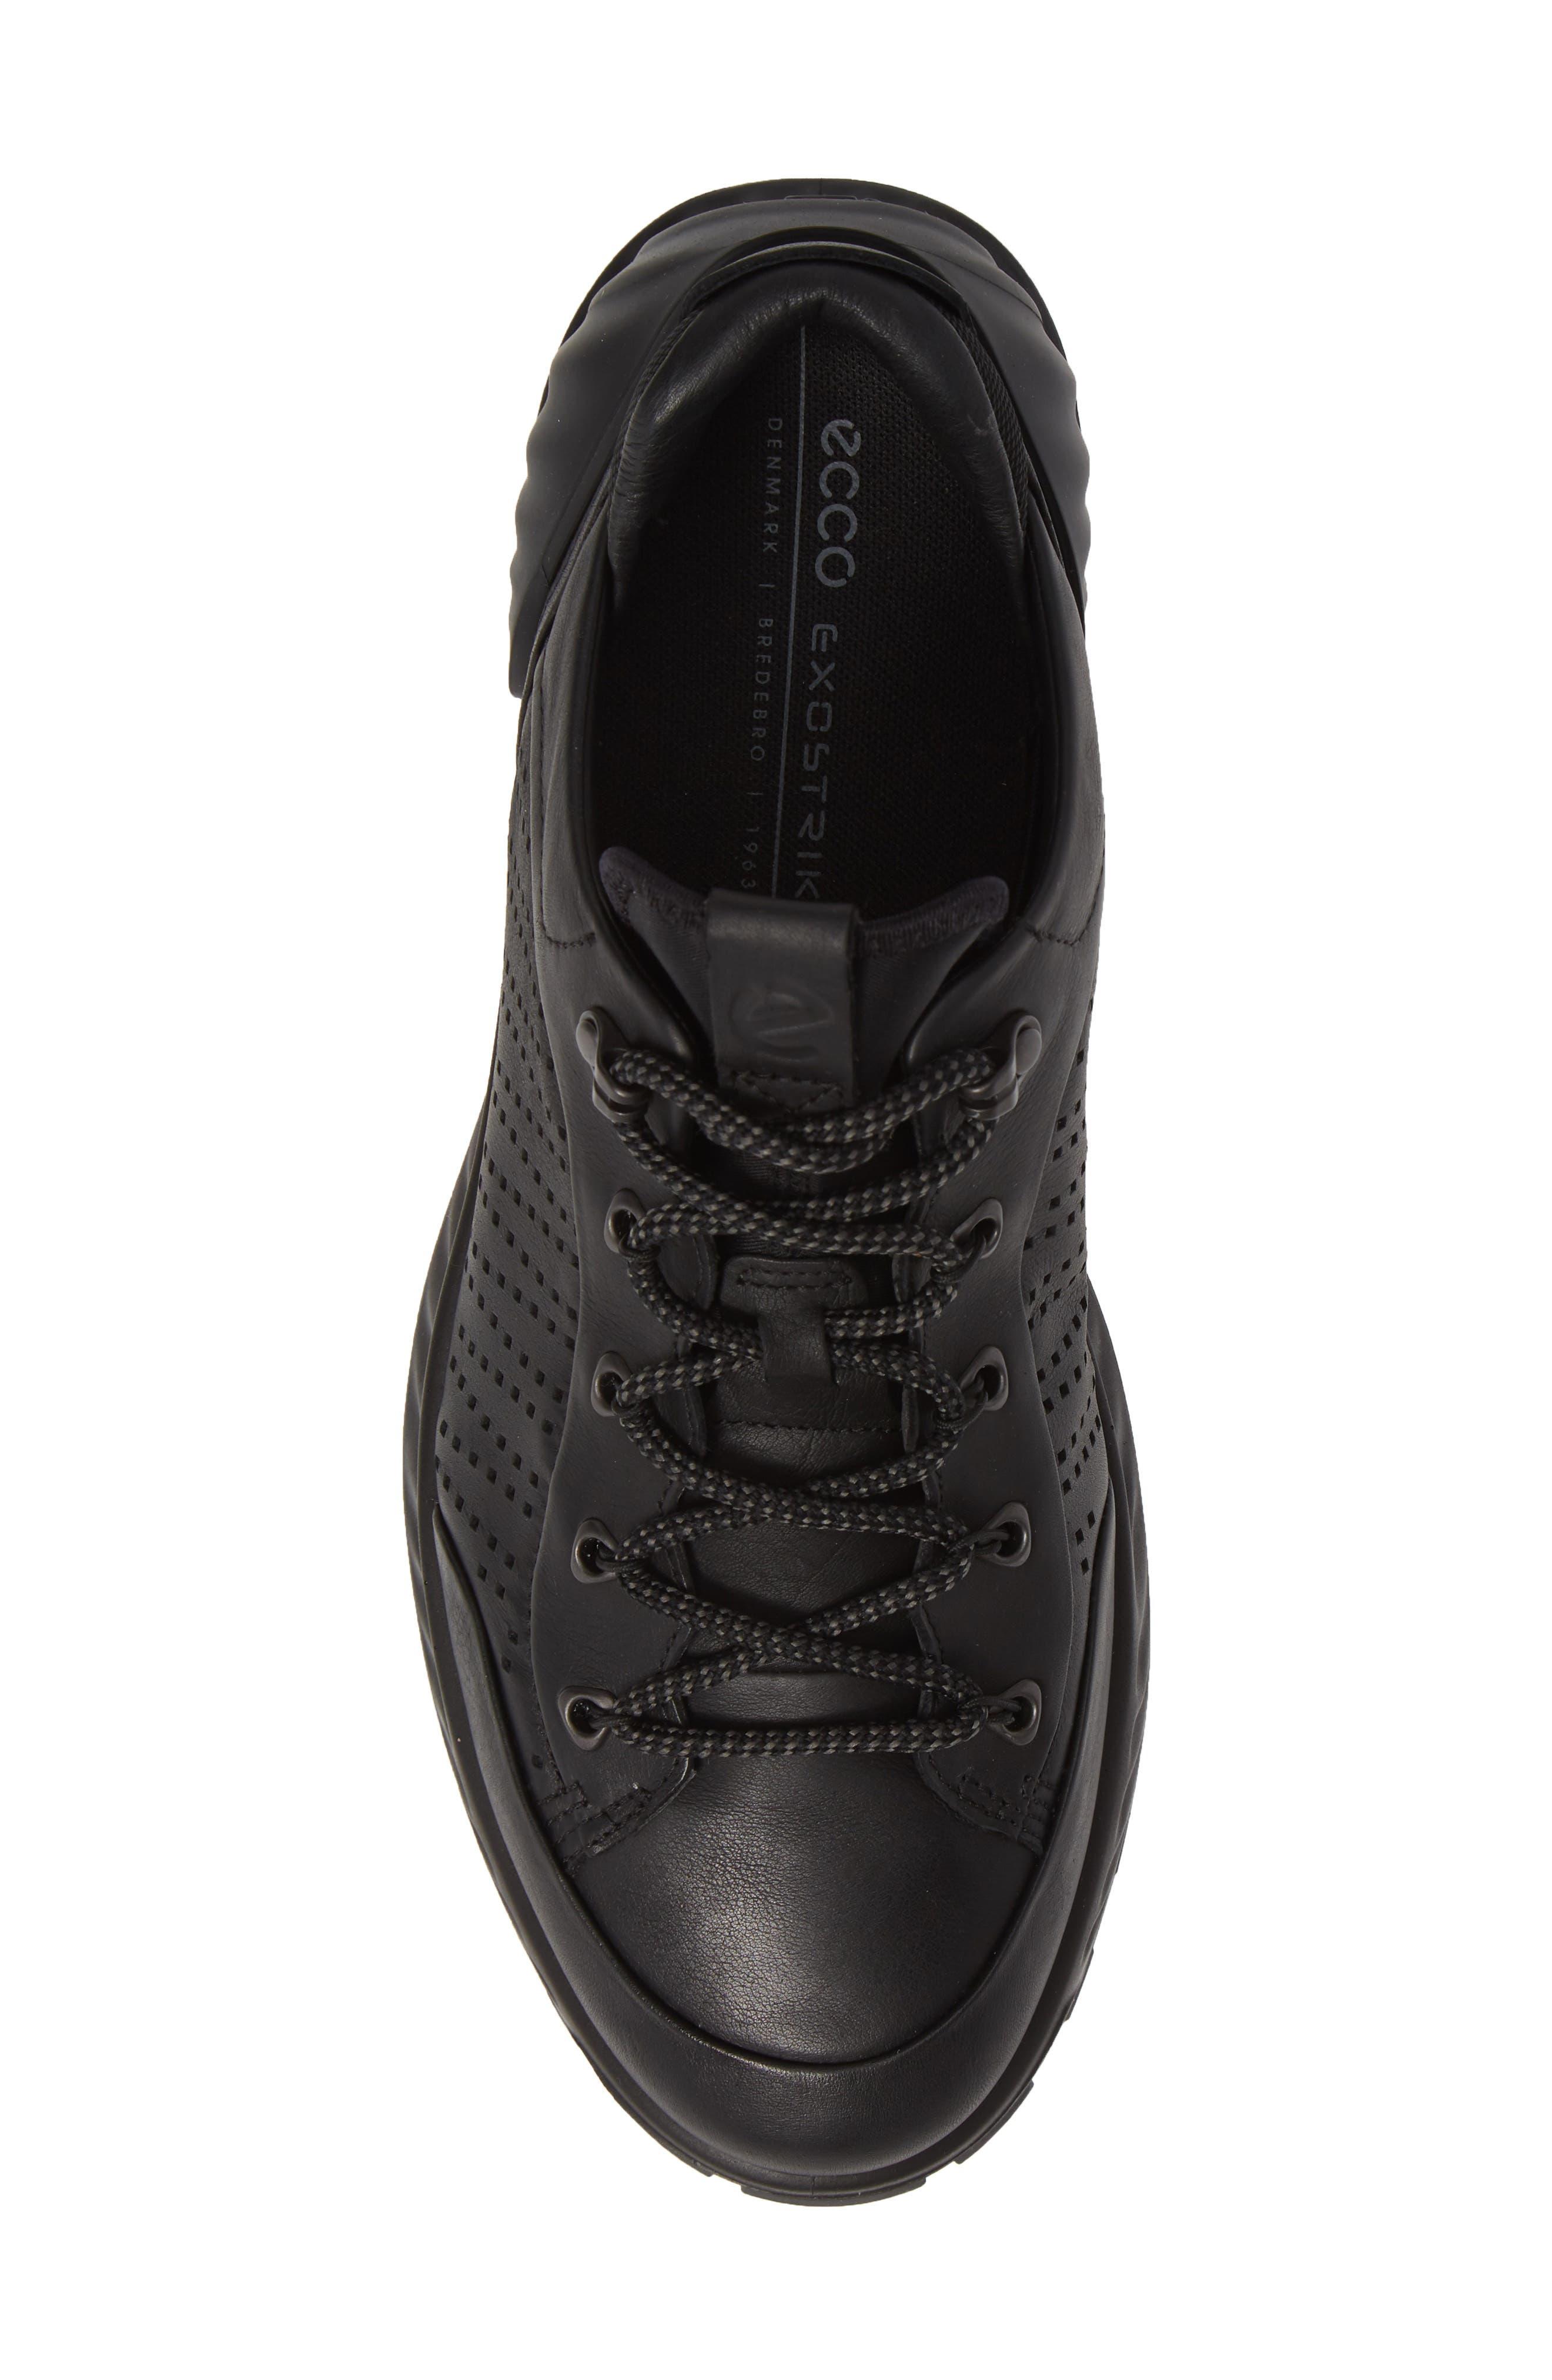 Exostrike High Top Sneaker,                             Alternate thumbnail 5, color,                             BLACK LEATHER